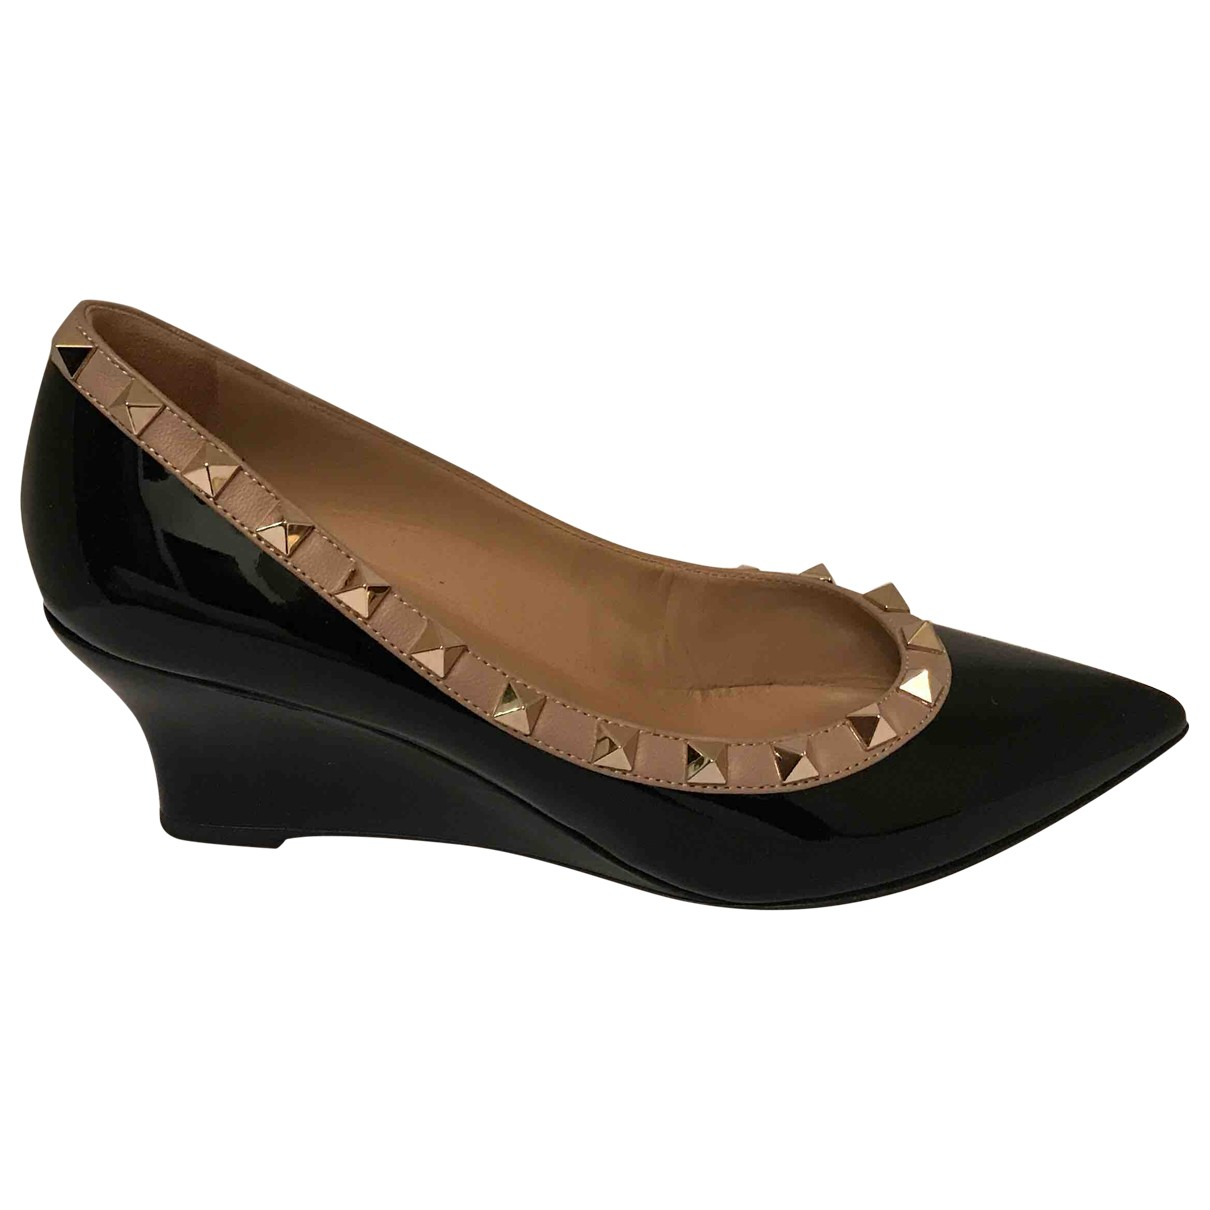 Valentino Garavani \N Black Patent leather Heels for Women 36 EU